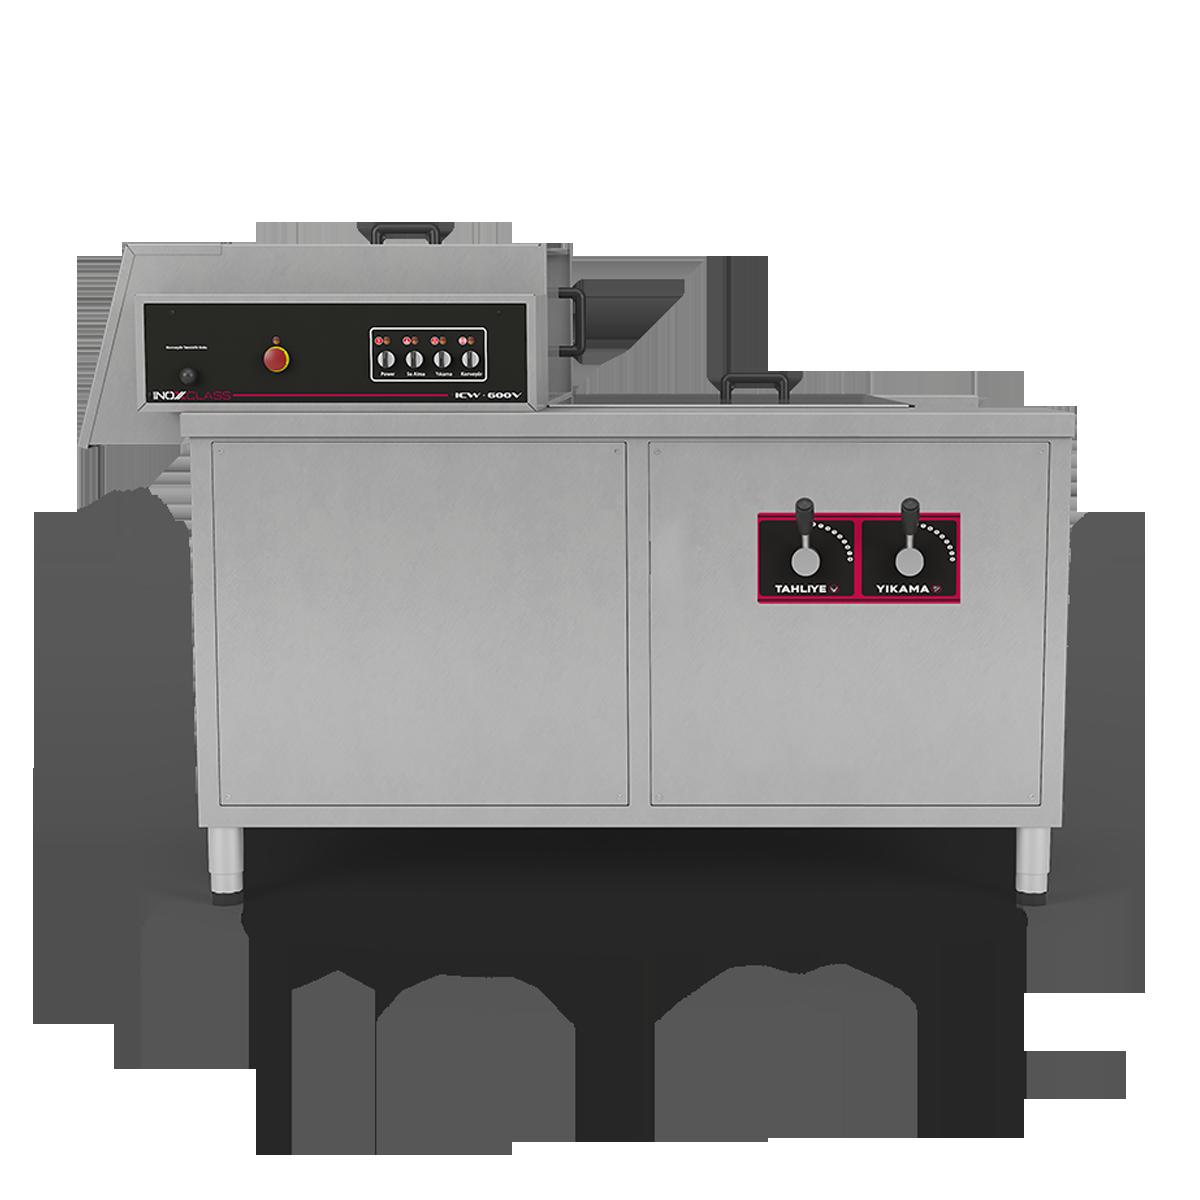 ICW-300V Sebze Yıkama Makinesi